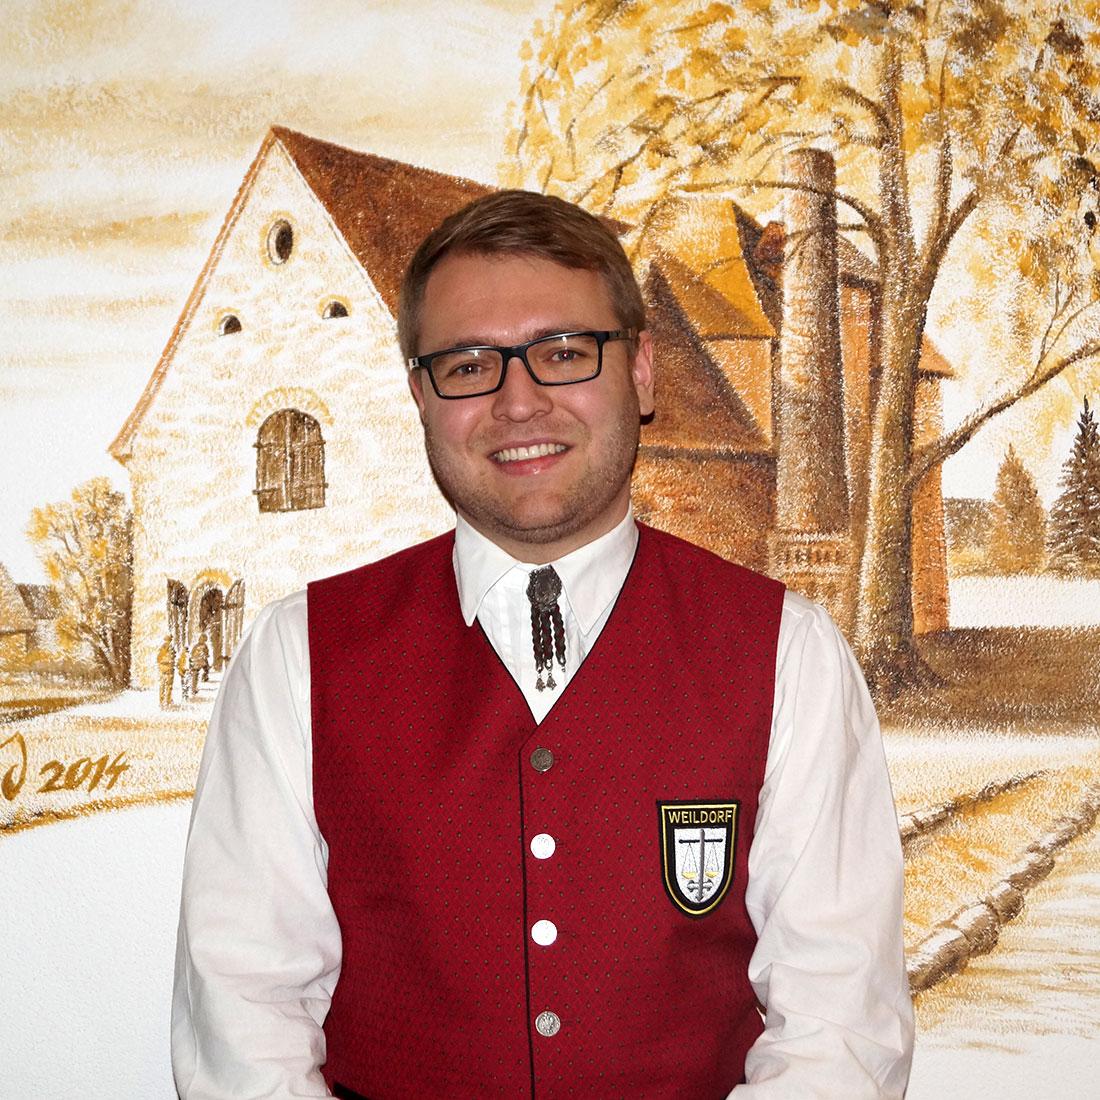 Florian Harnau